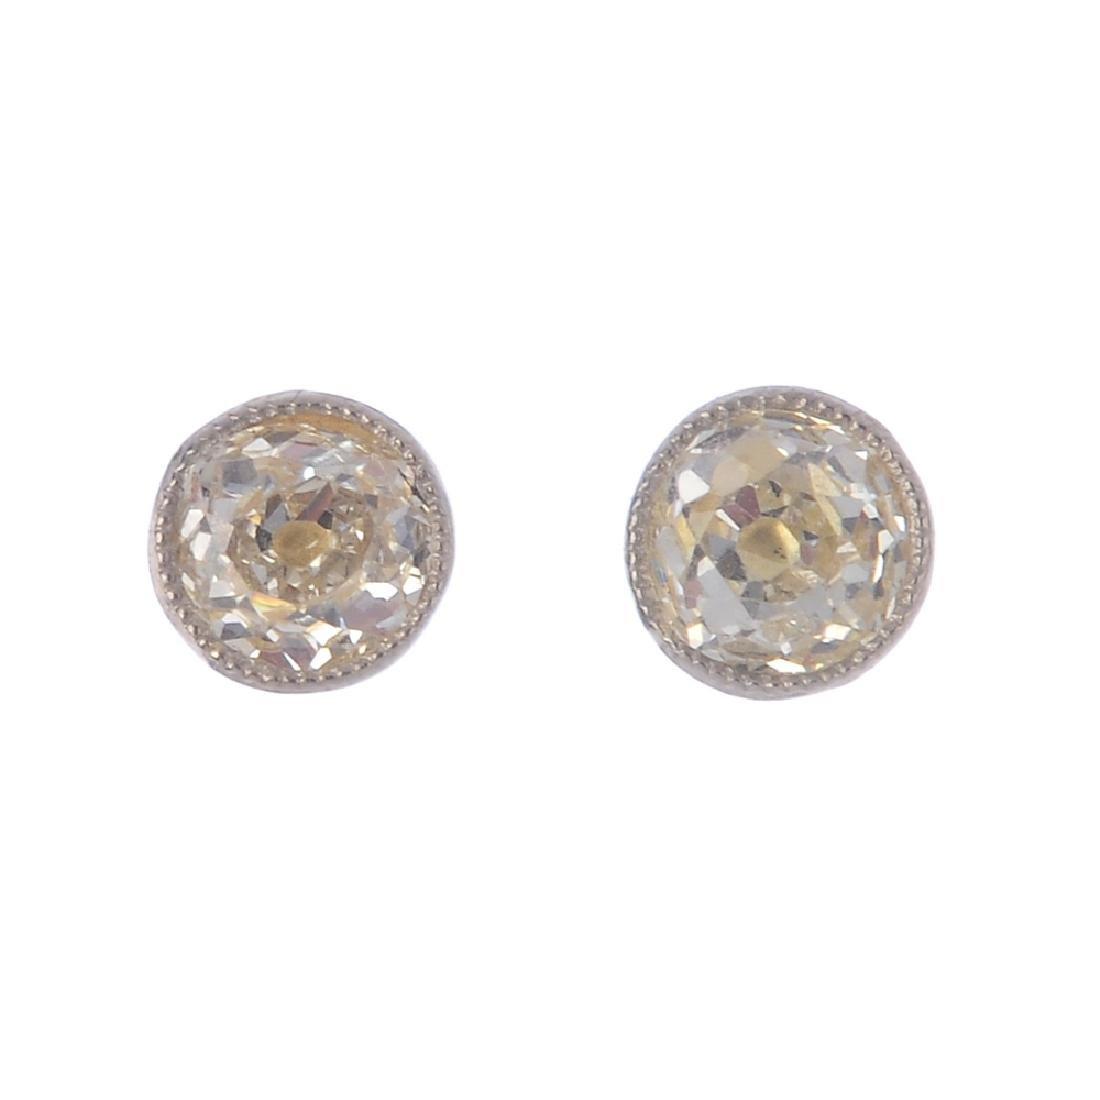 A pair of diamond stud earrings. Each designed as an